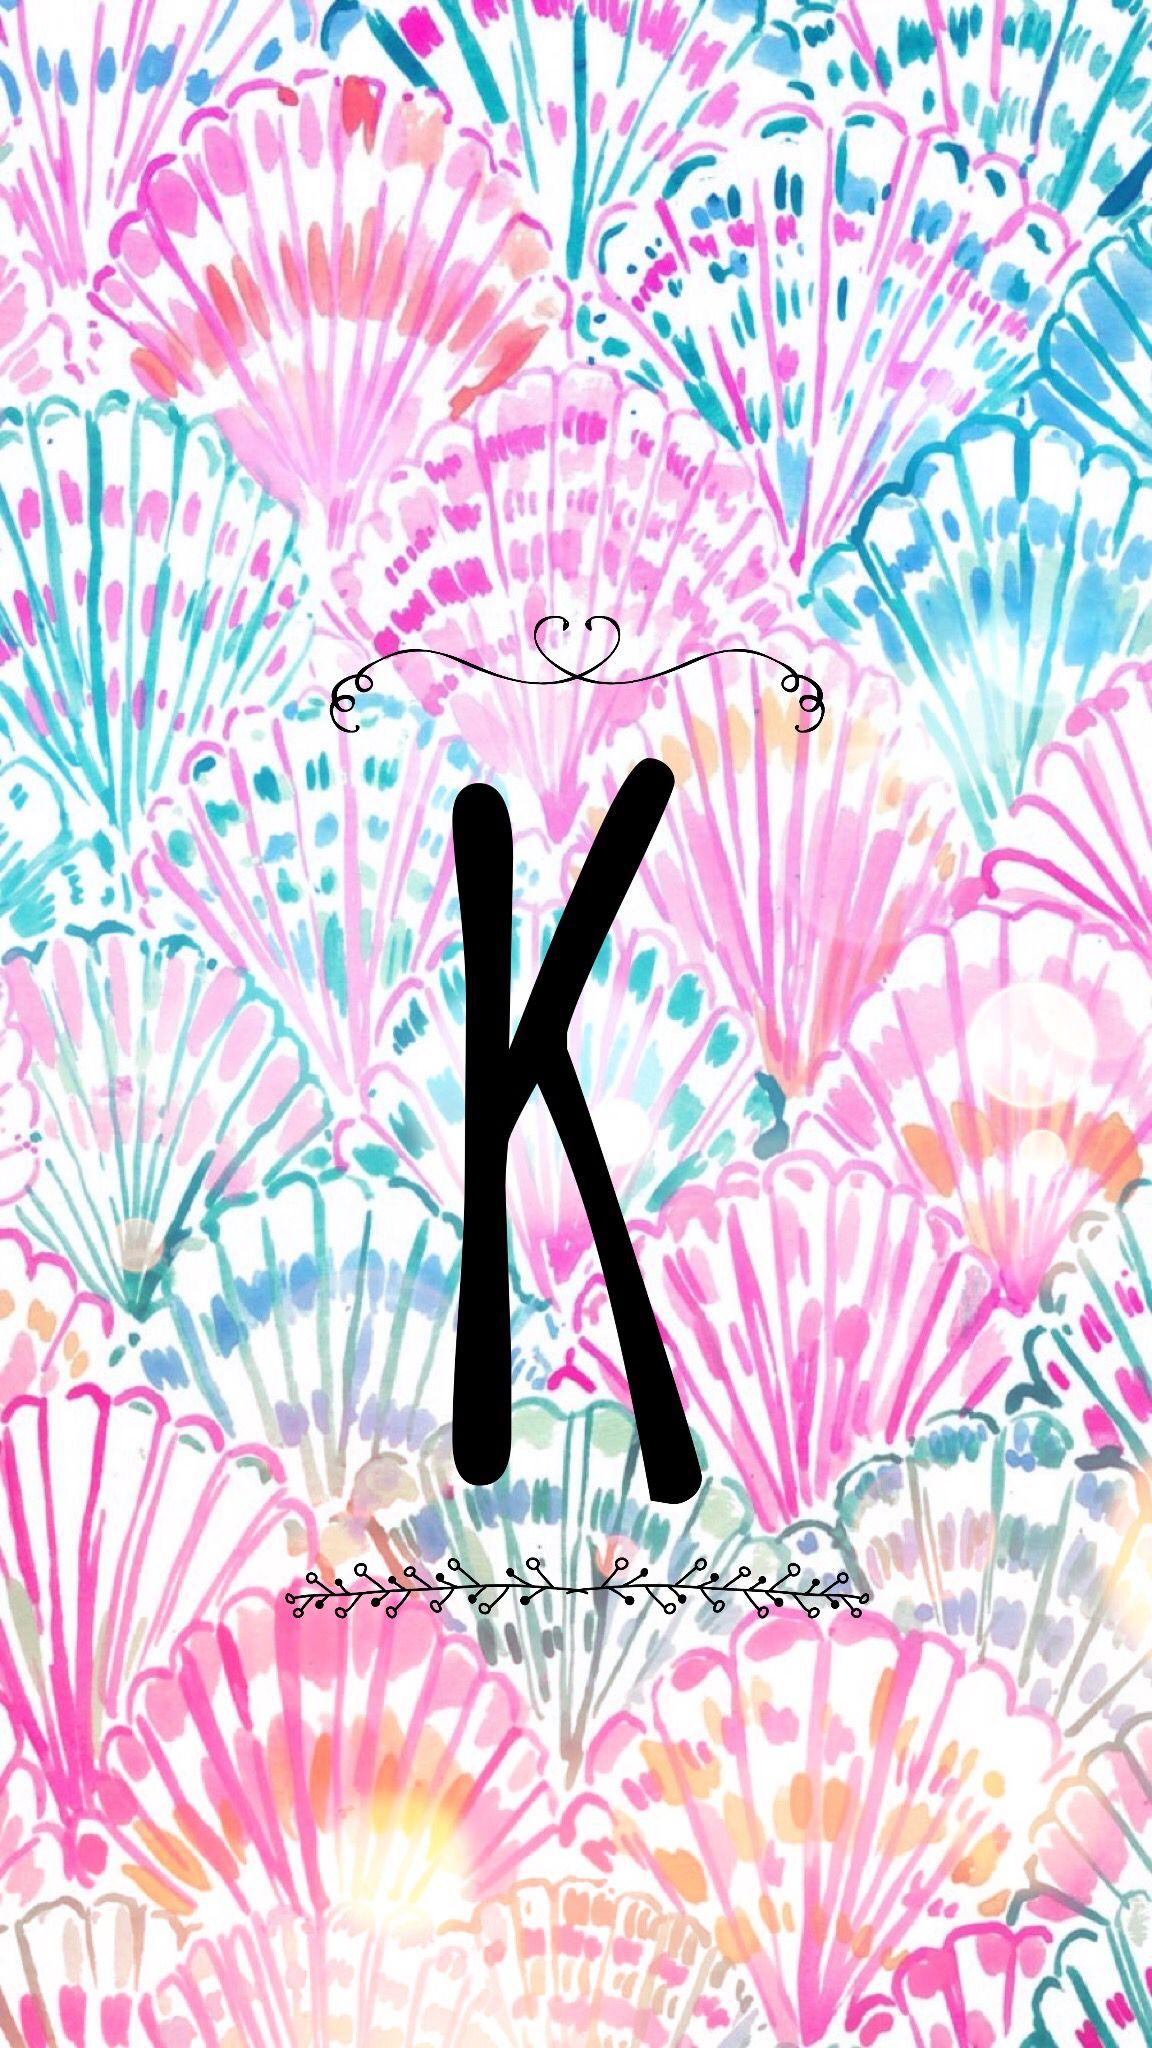 Letter K Iphone Wallpaper Mermaid Inspired Iphone Background Art Mermaid Wallpaper Iphone Mermaid Wallpapers